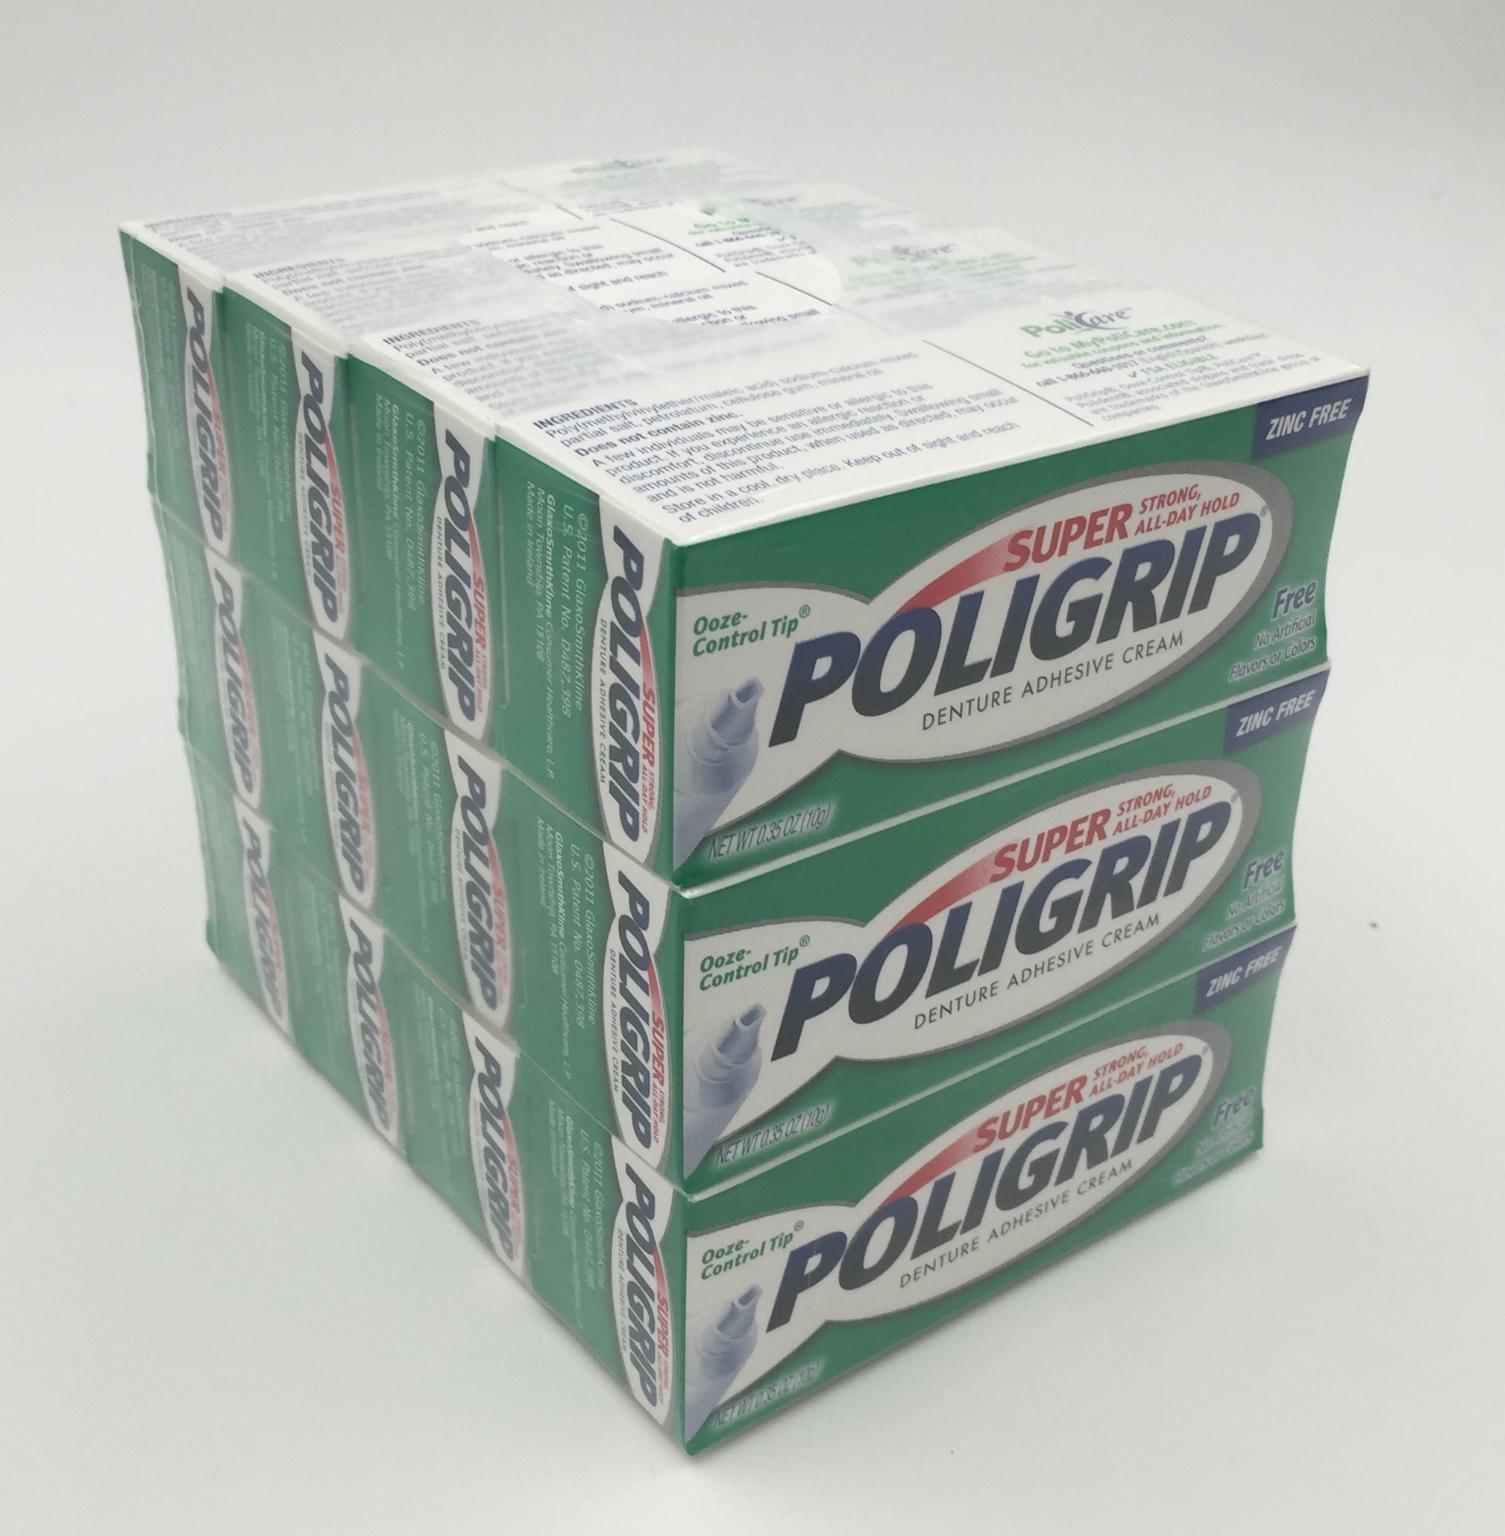 Lot of 12 0.35oz Super Poligrip Denture Adhesive Cream Pocket Size